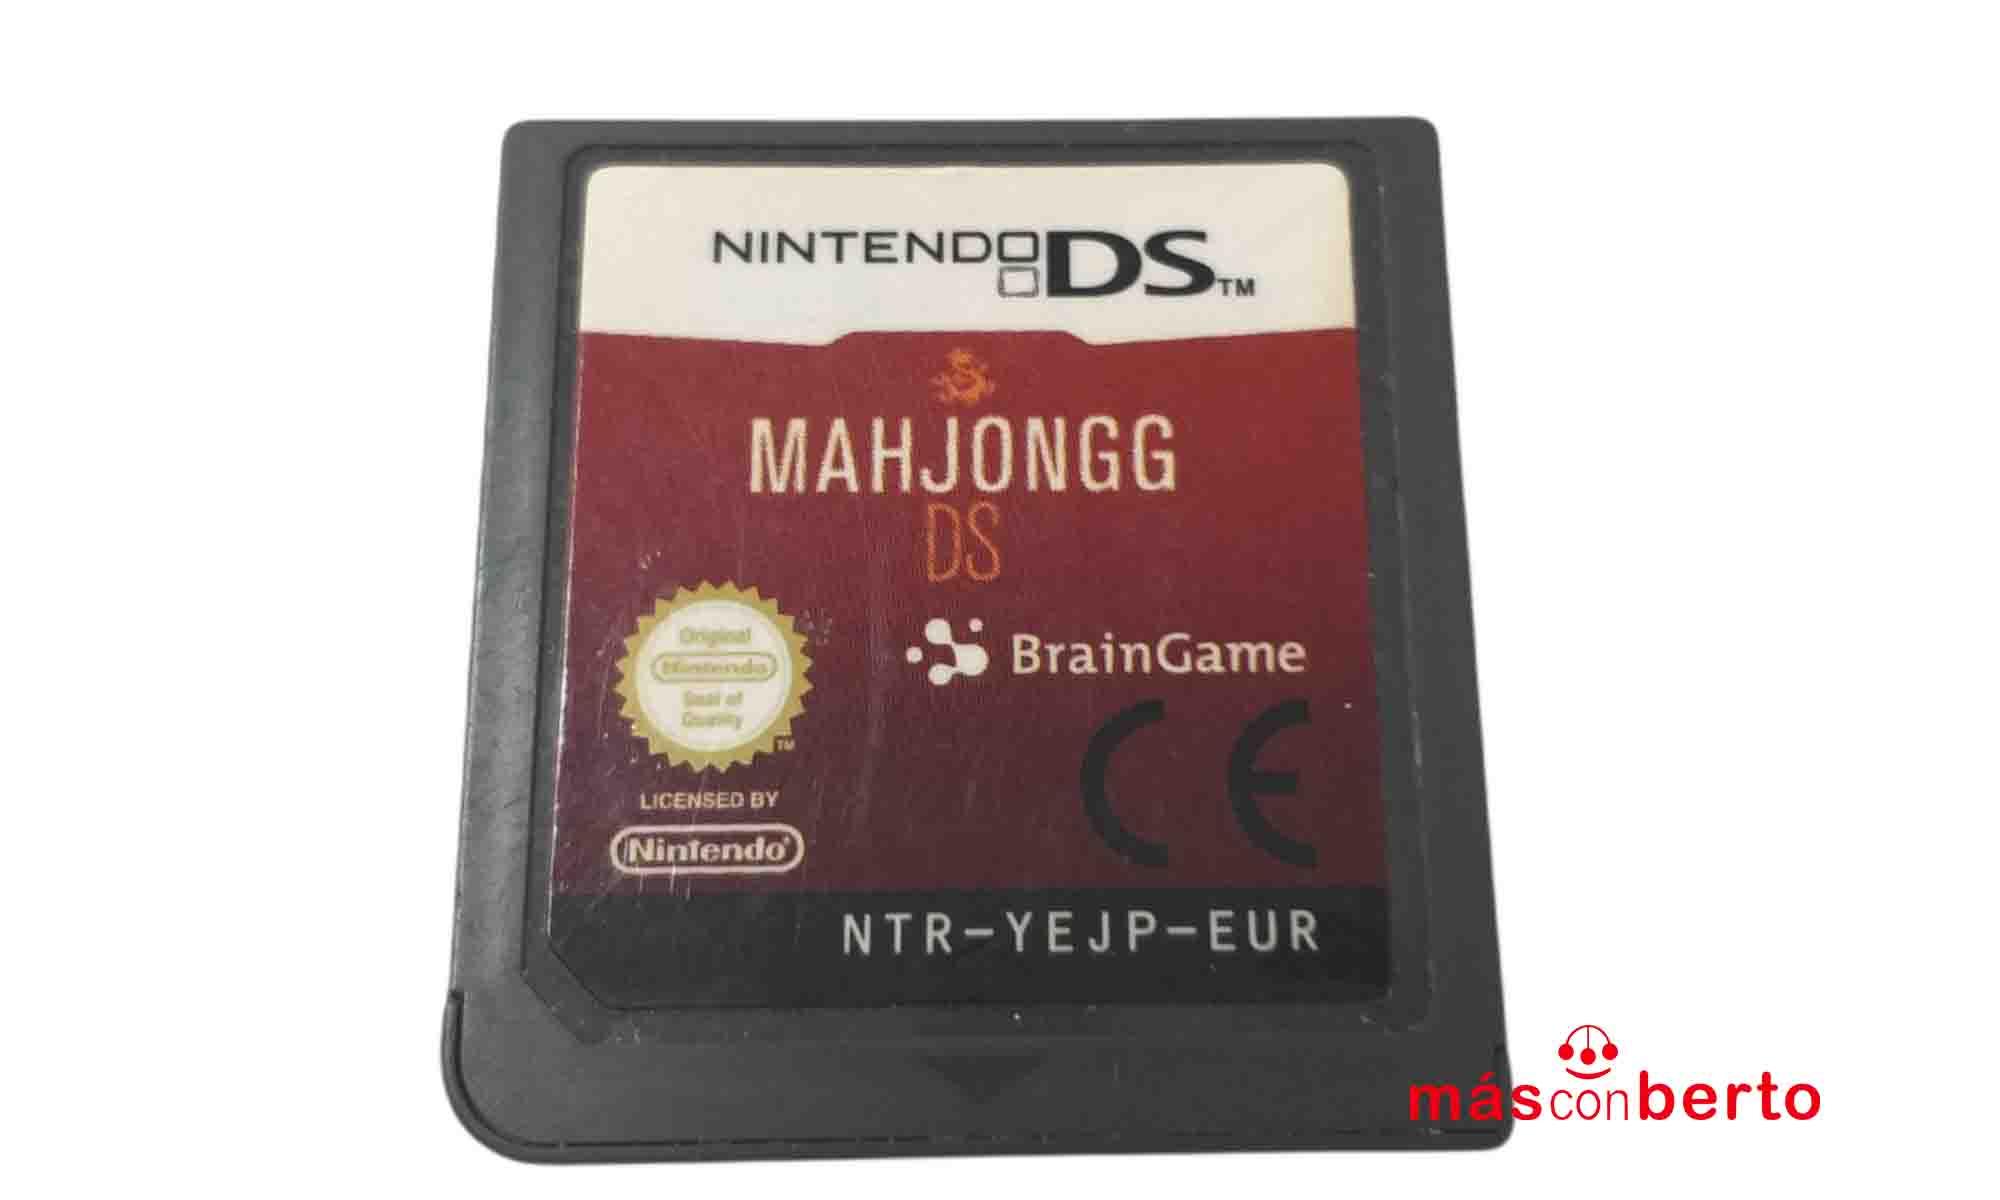 Juego Nintendo DS Mahjongg...